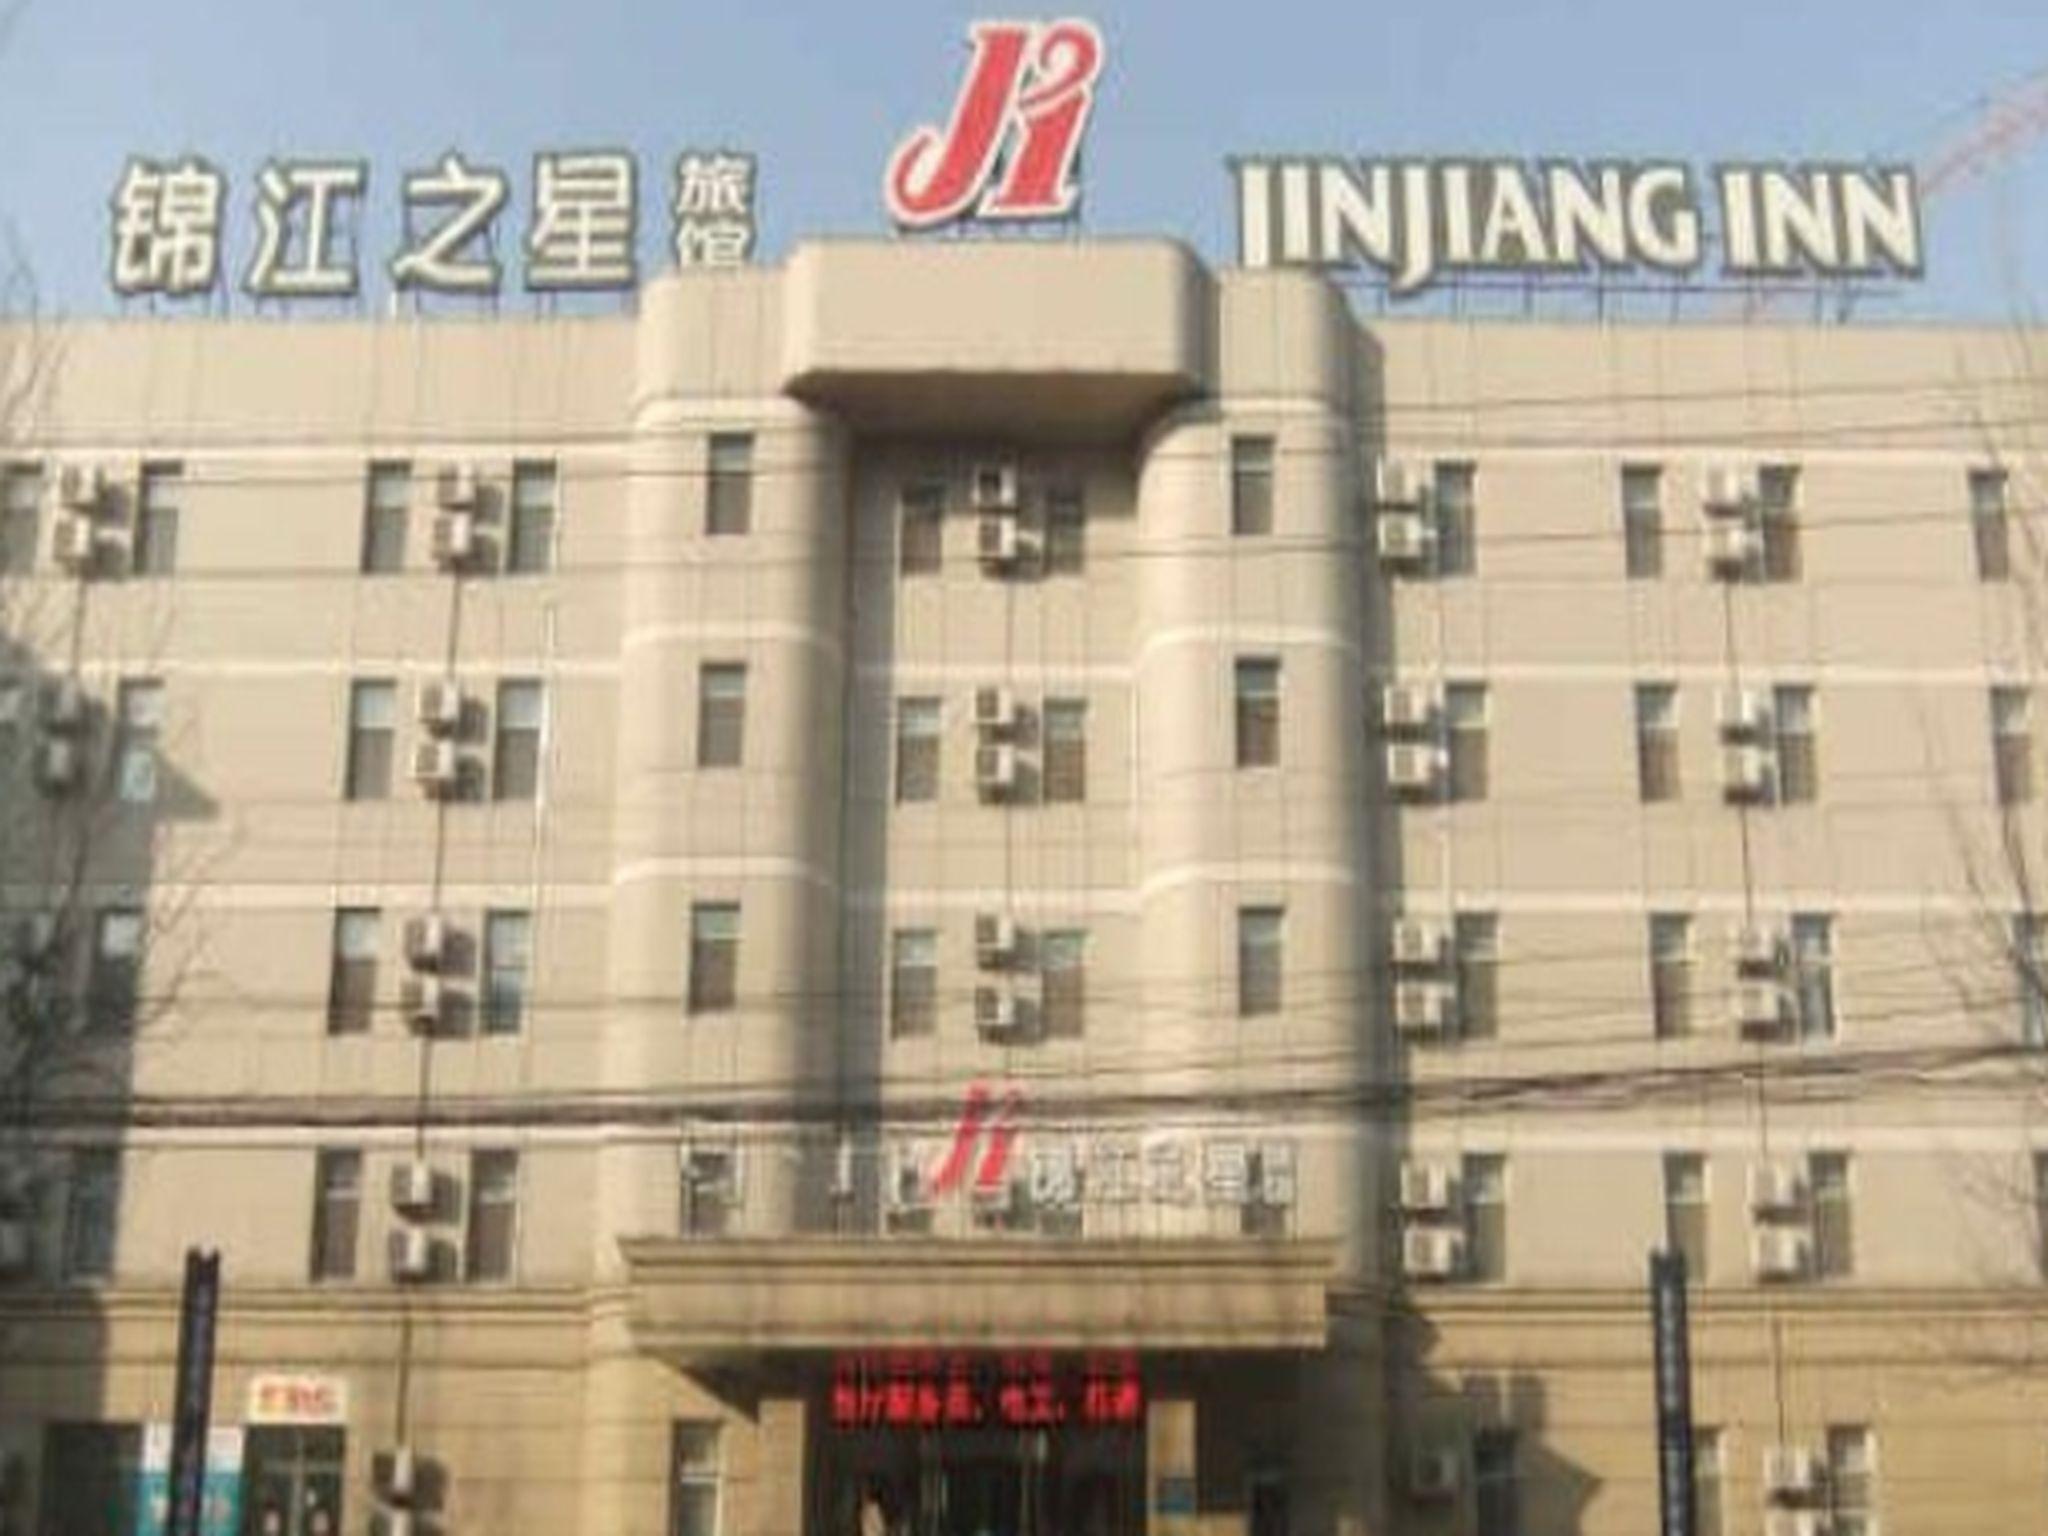 Jinjiang Inn Hohhot South Hulun Buir Road